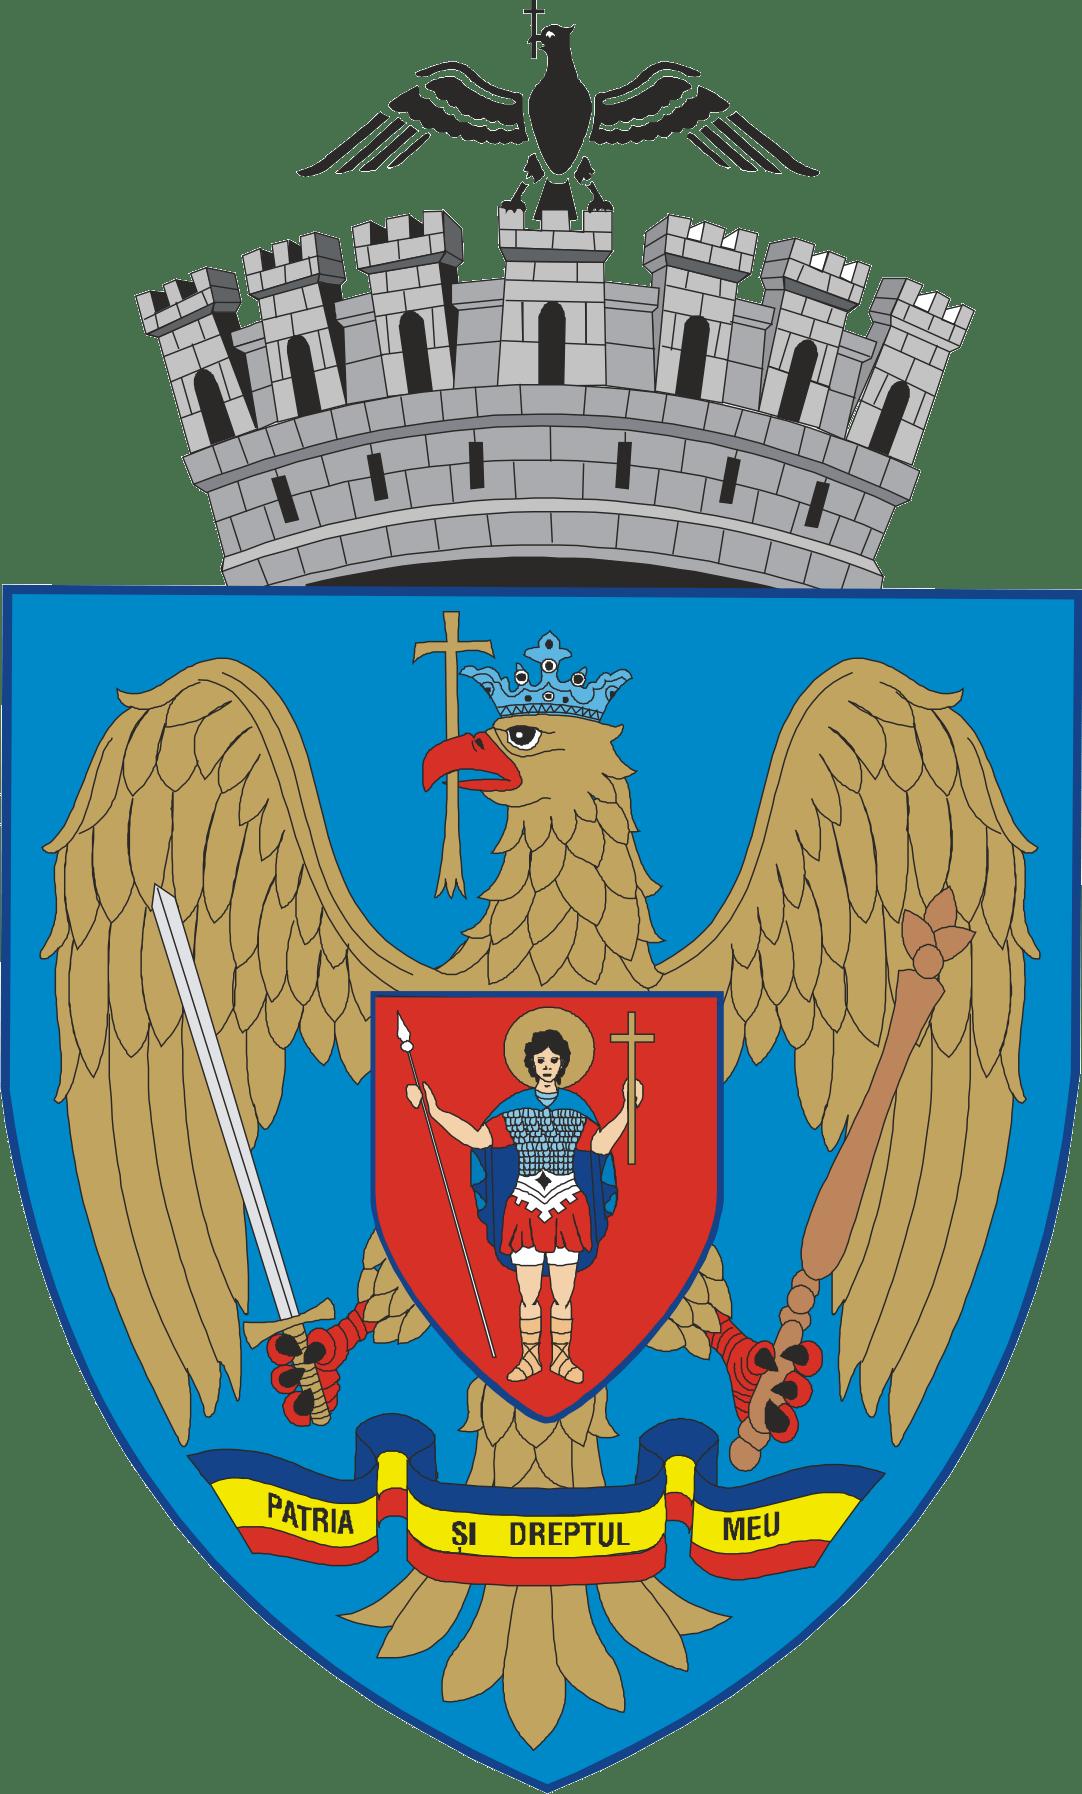 https://i0.wp.com/upload.wikimedia.org/wikipedia/commons/1/19/ROU_Bucharest_CoA.png